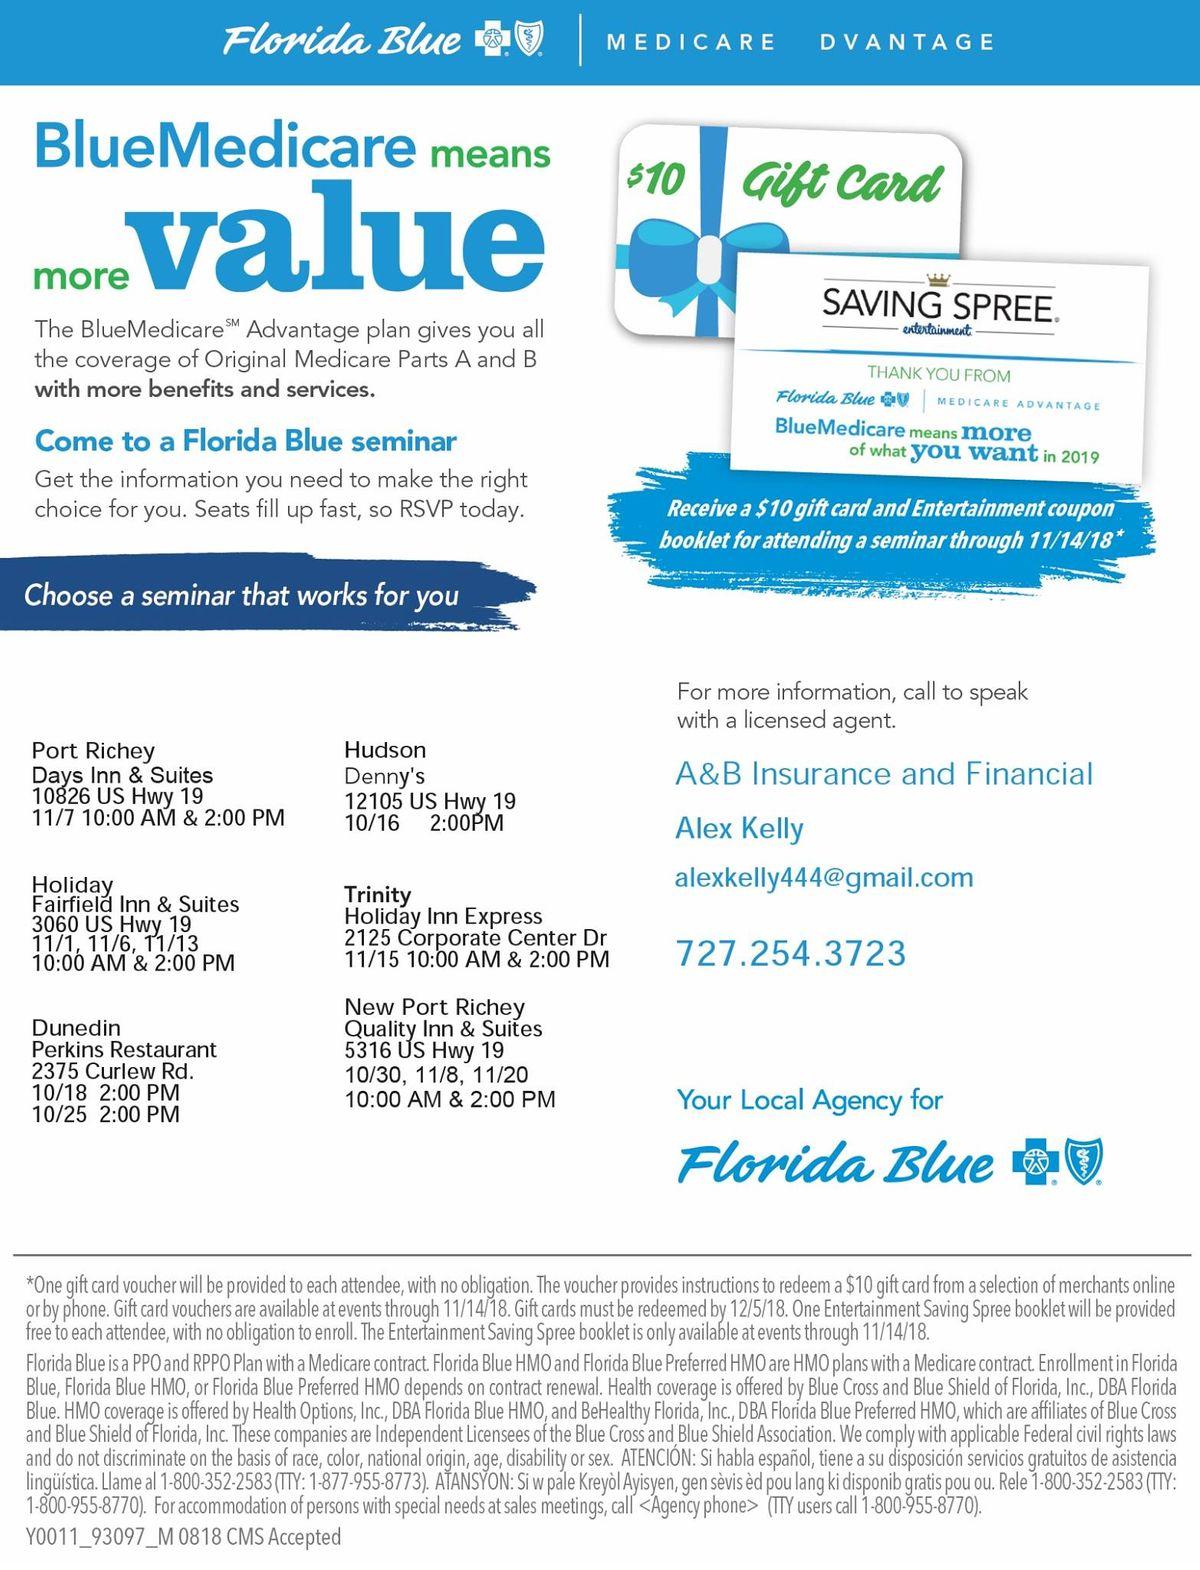 Florida Blue Medicare >> Florida Blue Medicare Seminar At Holiday Inn Express Suites